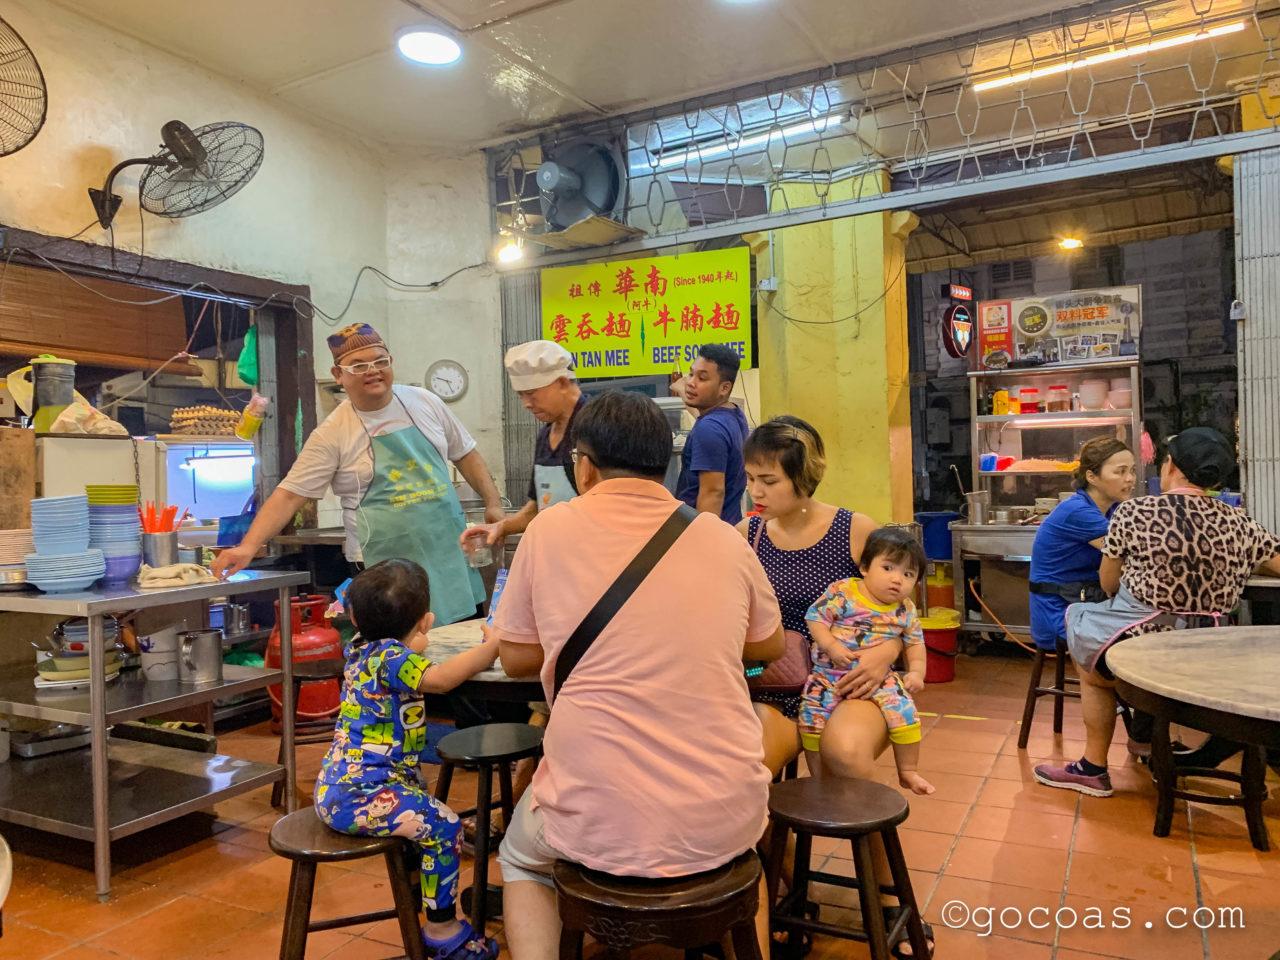 Xi Nan Cafeの賑わう店内